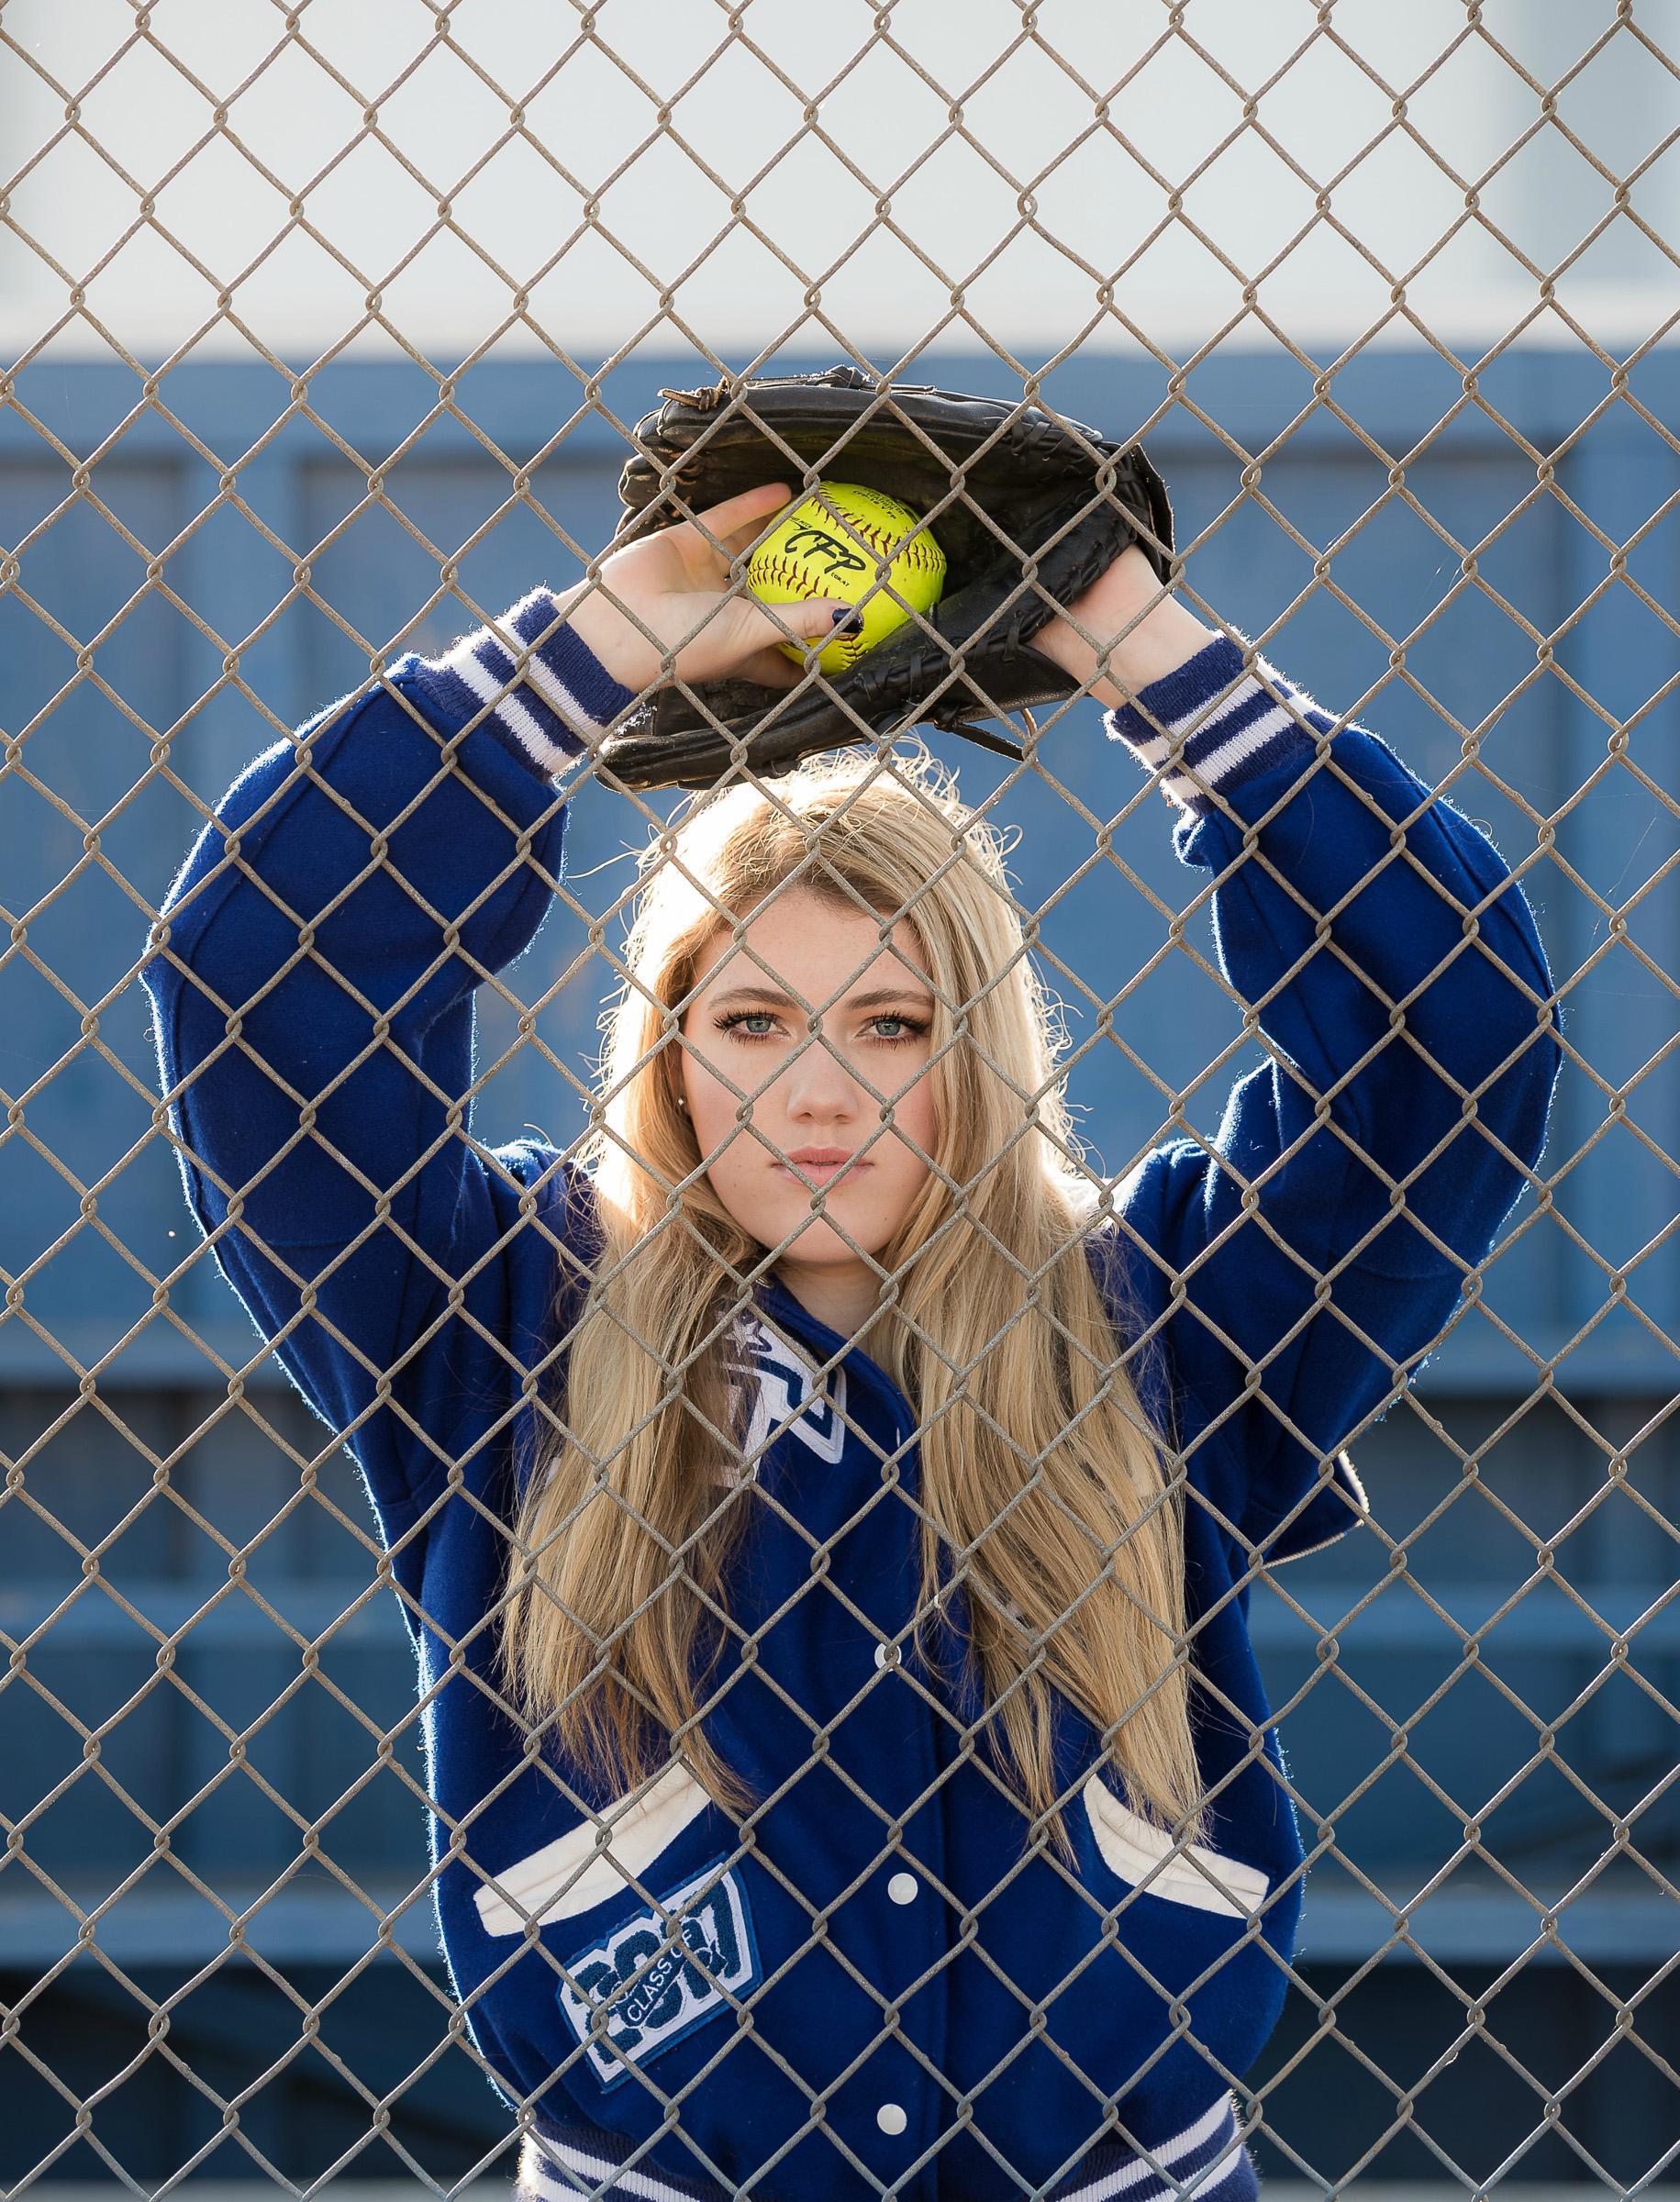 HumboldtCountySeniorPhotographer-Shelby-FortunaHigh-Softball-4.JPG